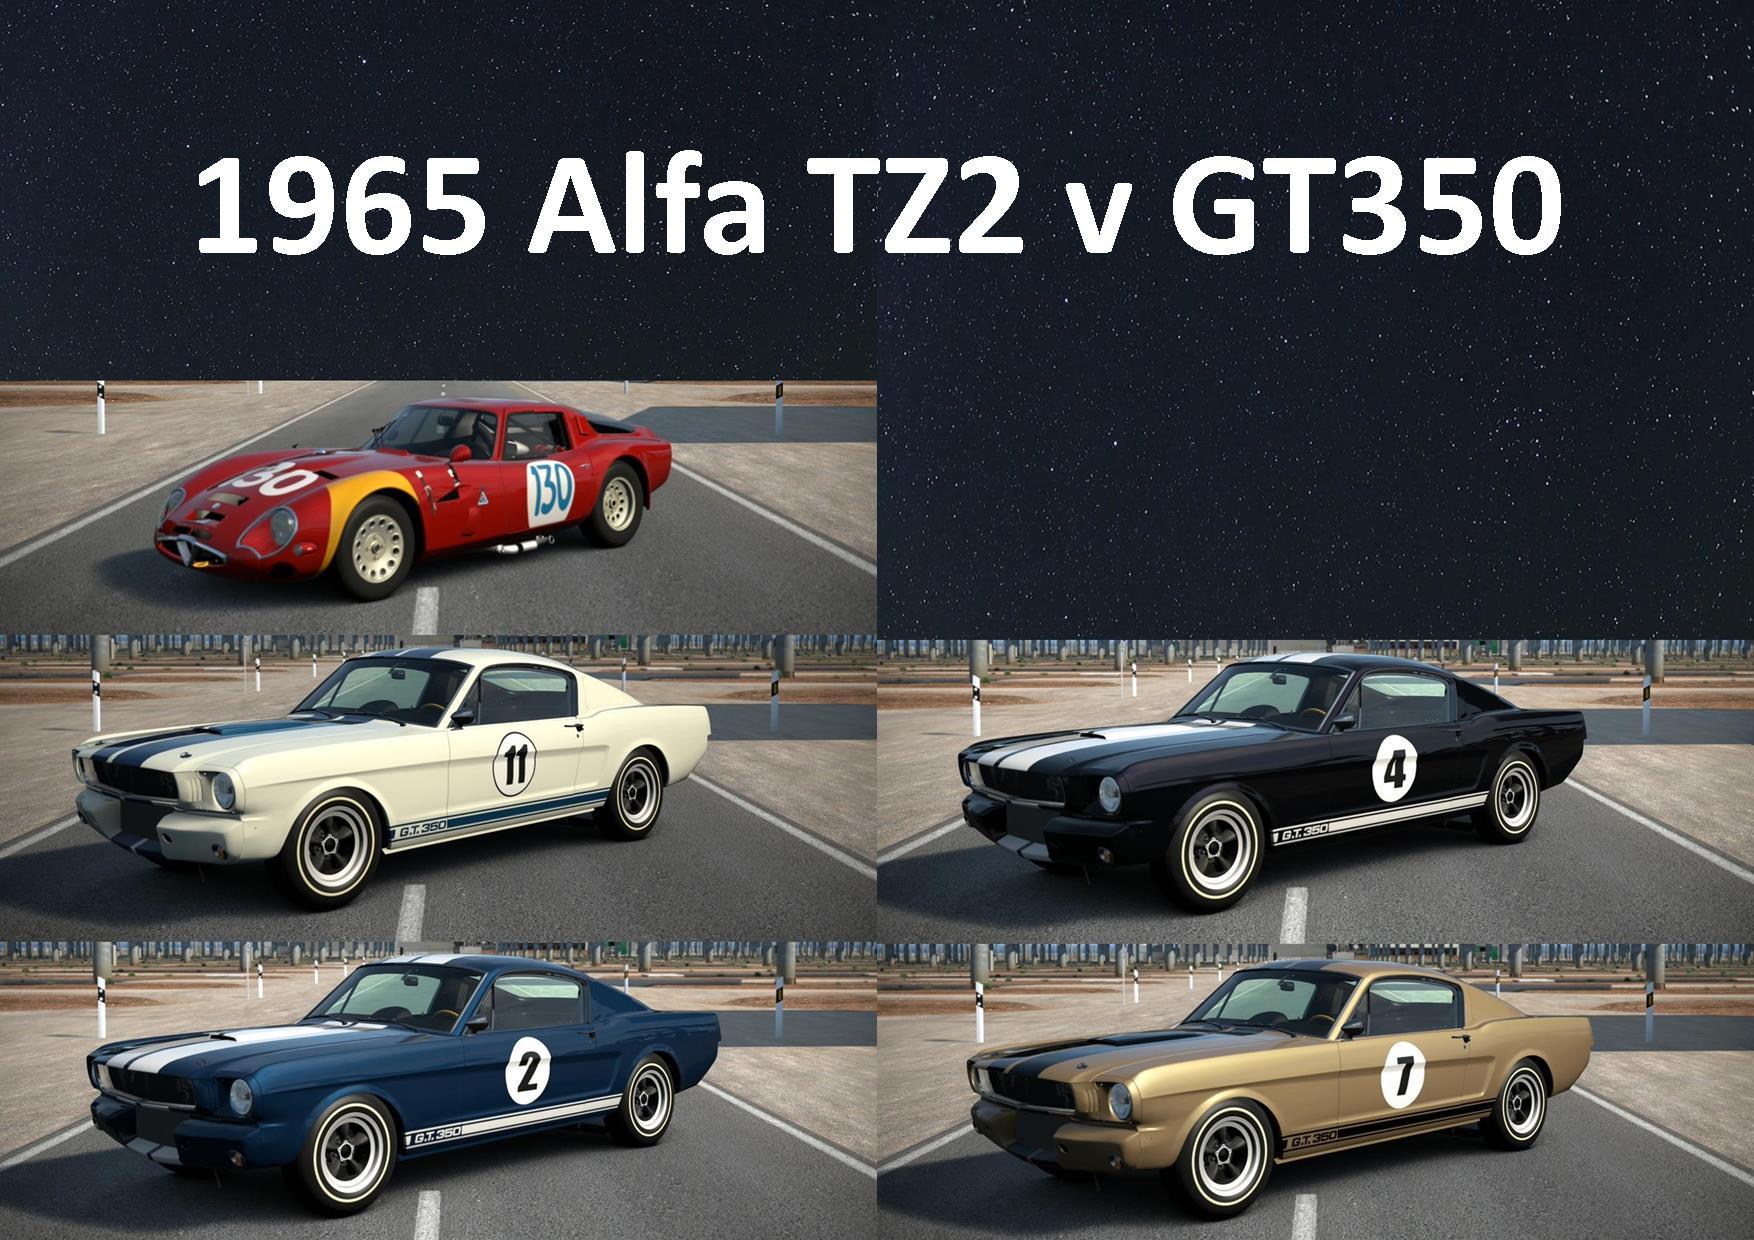 Alfa TZ2 v GT350 Poster.jpg